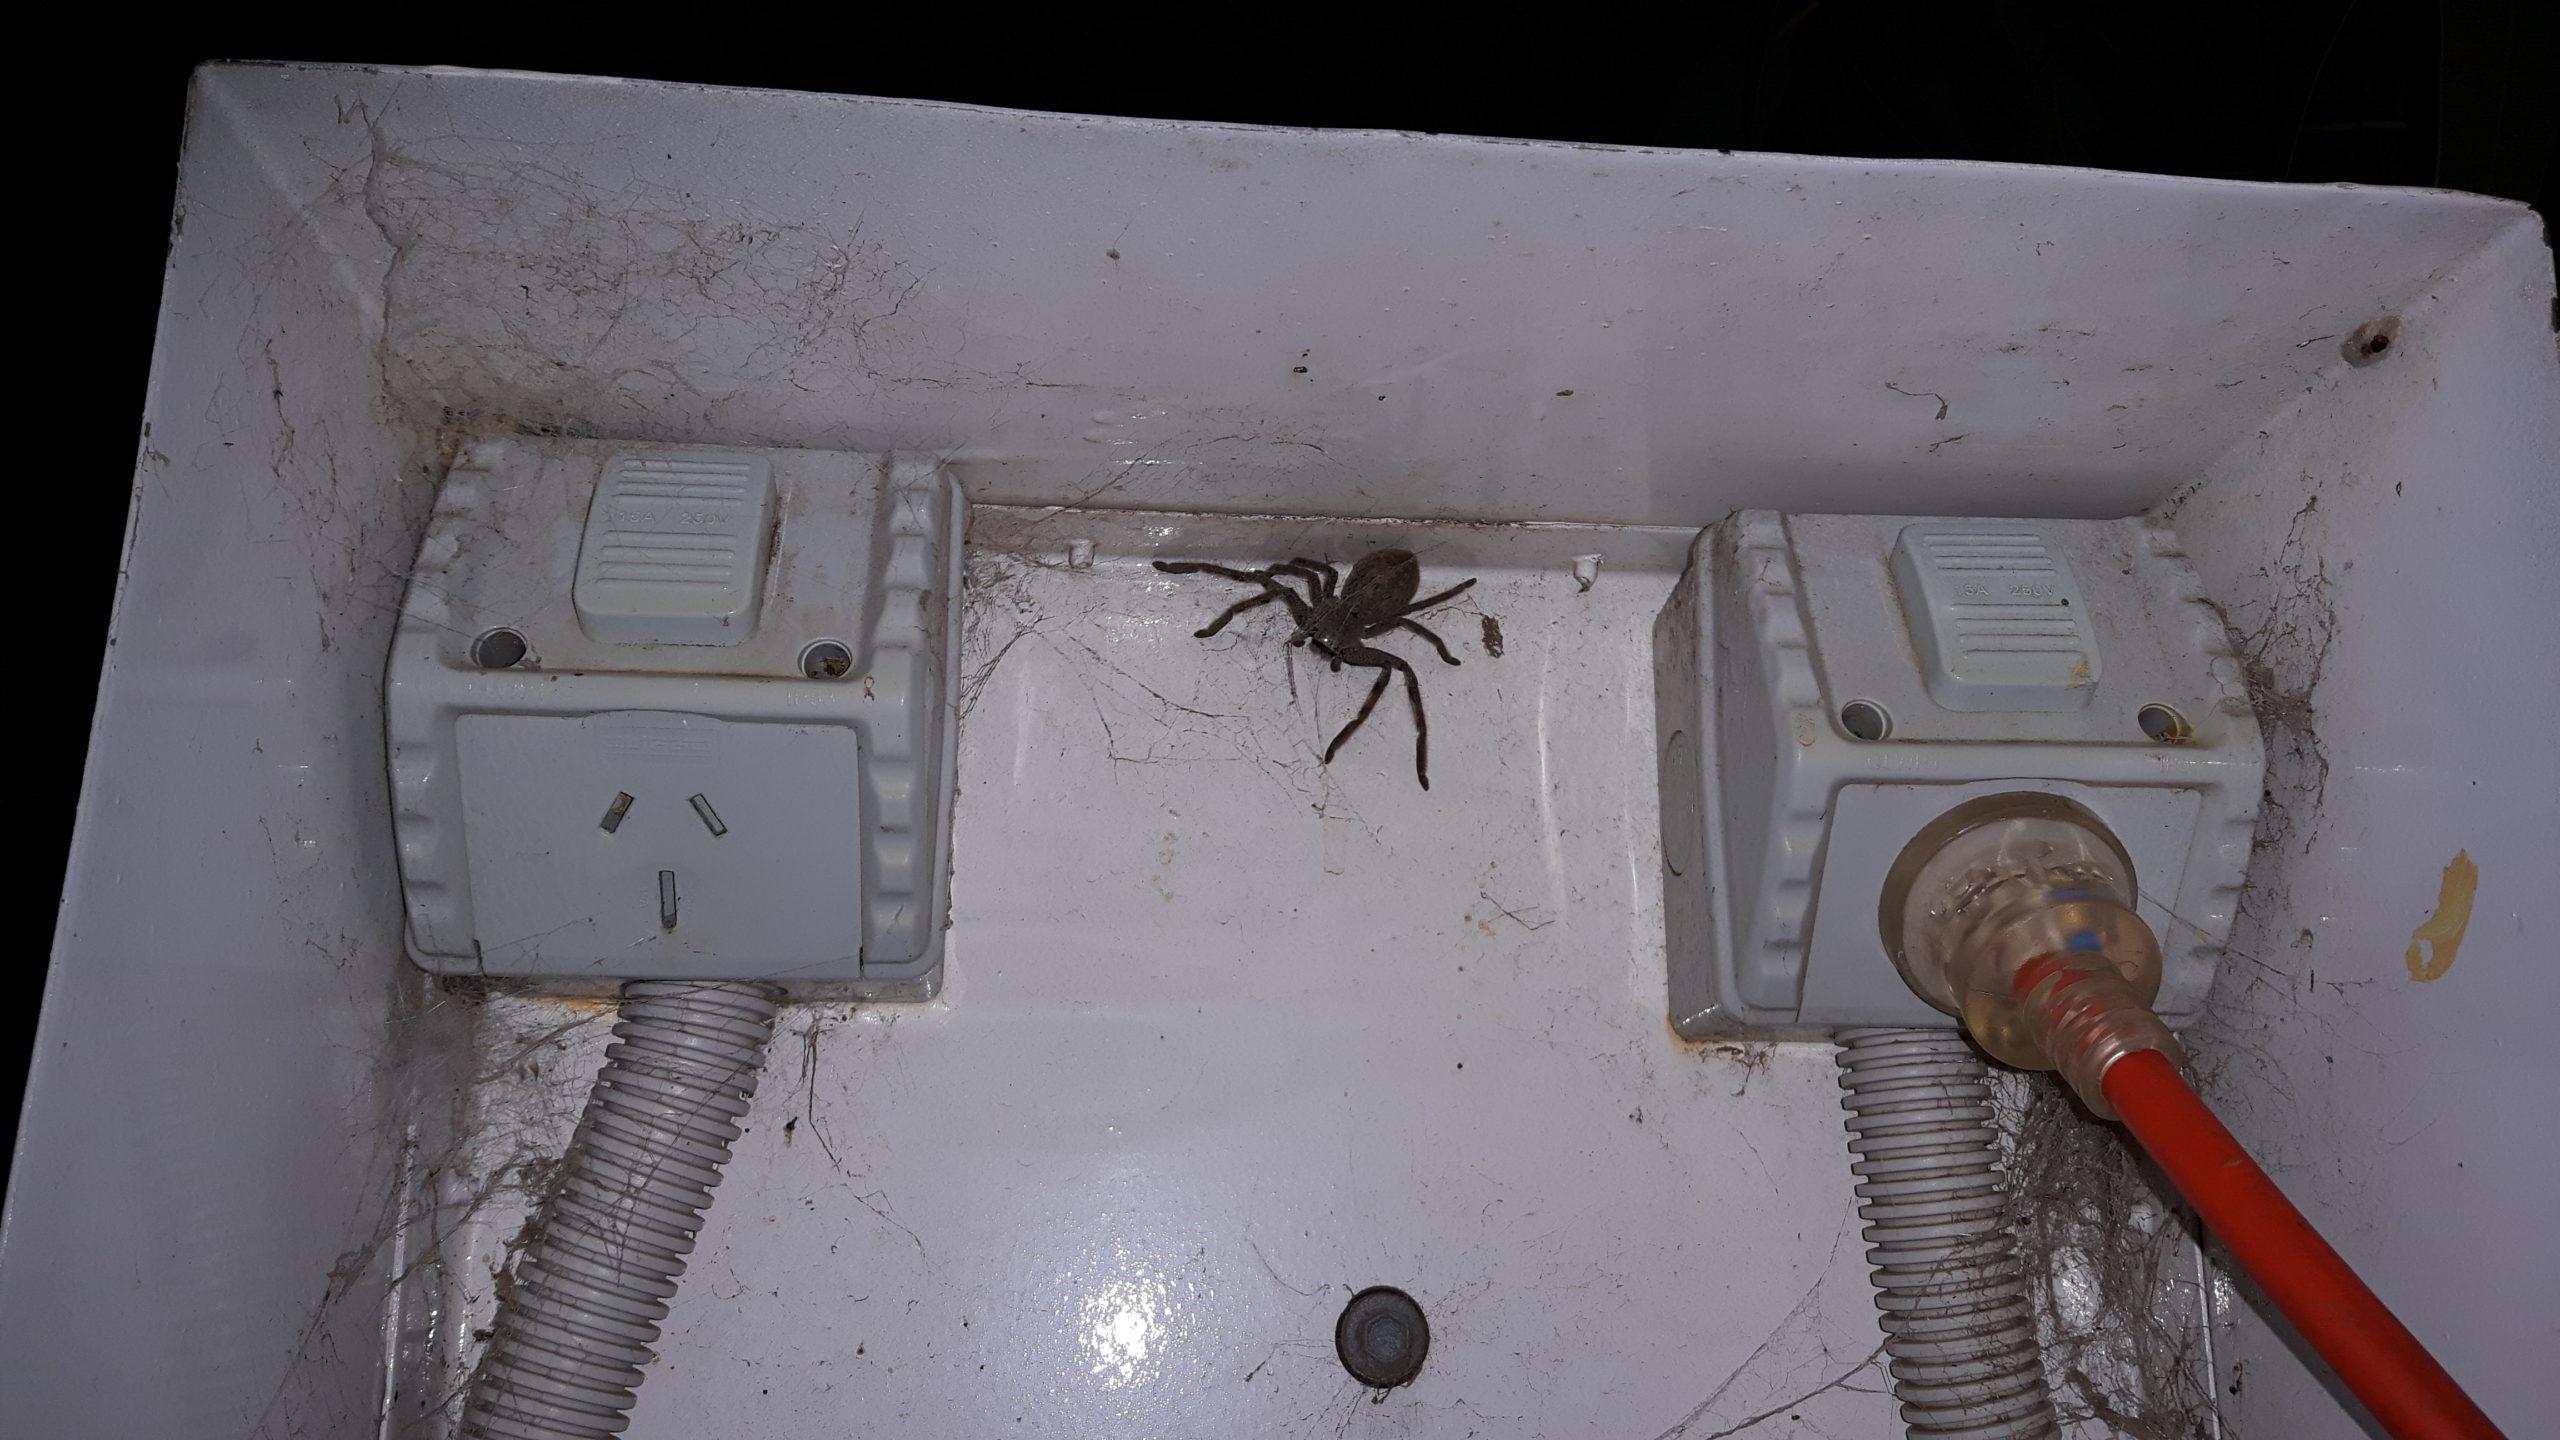 Spinne, spyder, Australien, Cape Jervis, Huntsman, Campingplatz, Campsite